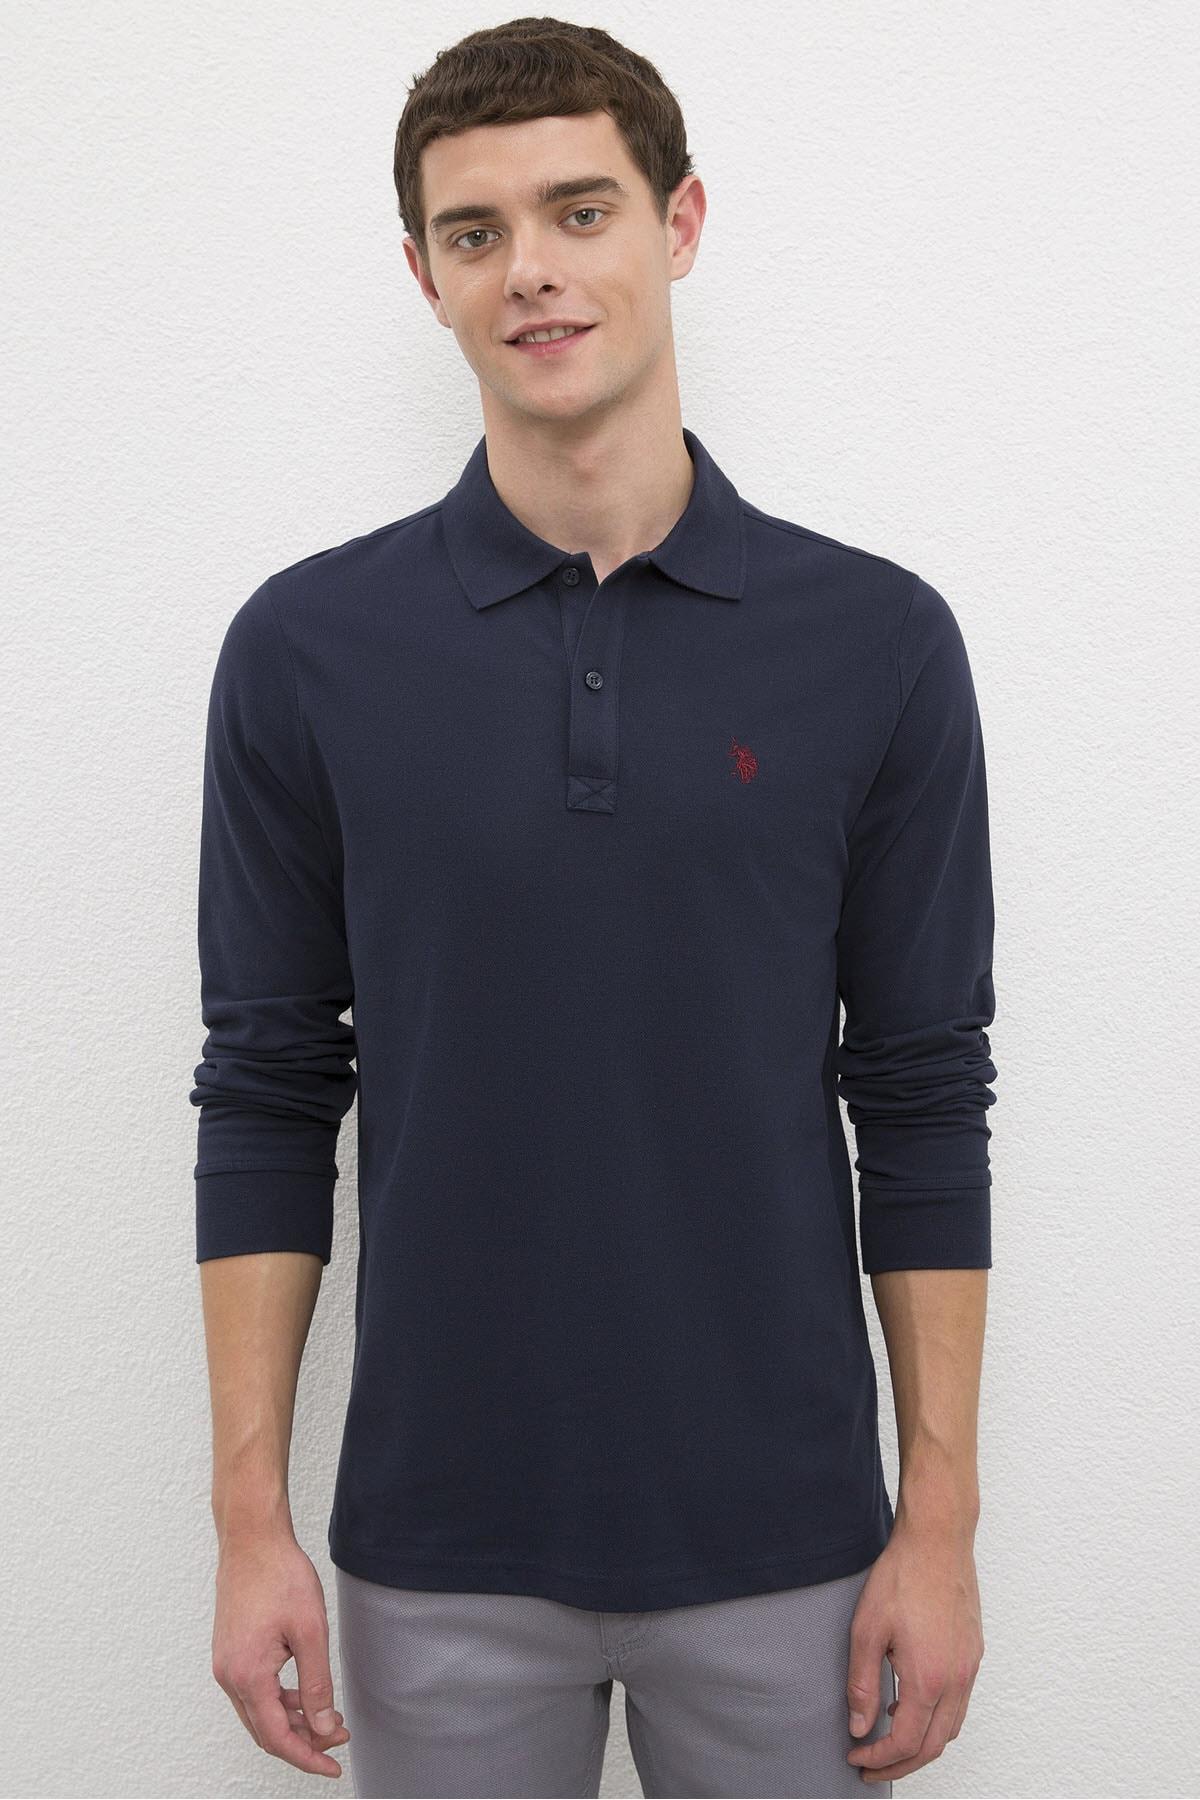 U.S. Polo Assn. Lacıvert Erkek Sweatshirt 1